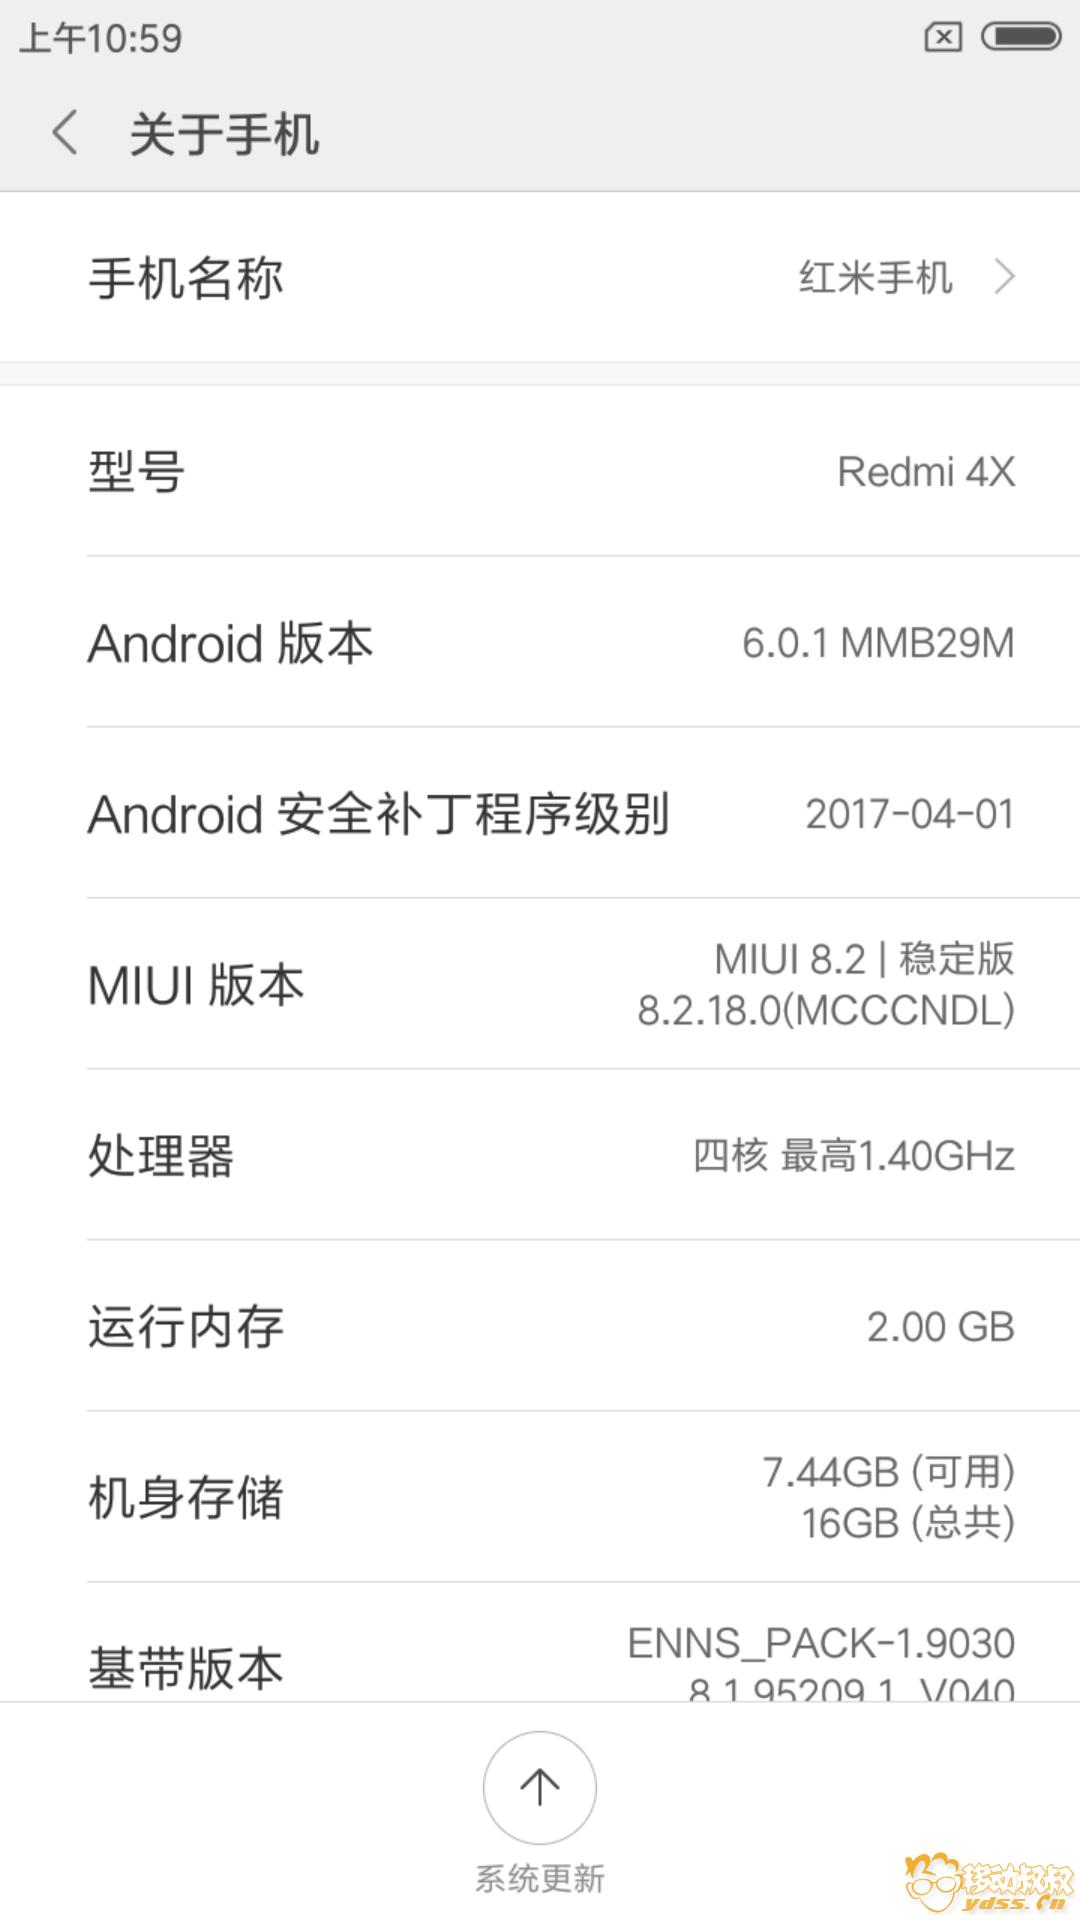 Screenshot_2017-07-24-10-59-06-041_com.android.settings.png